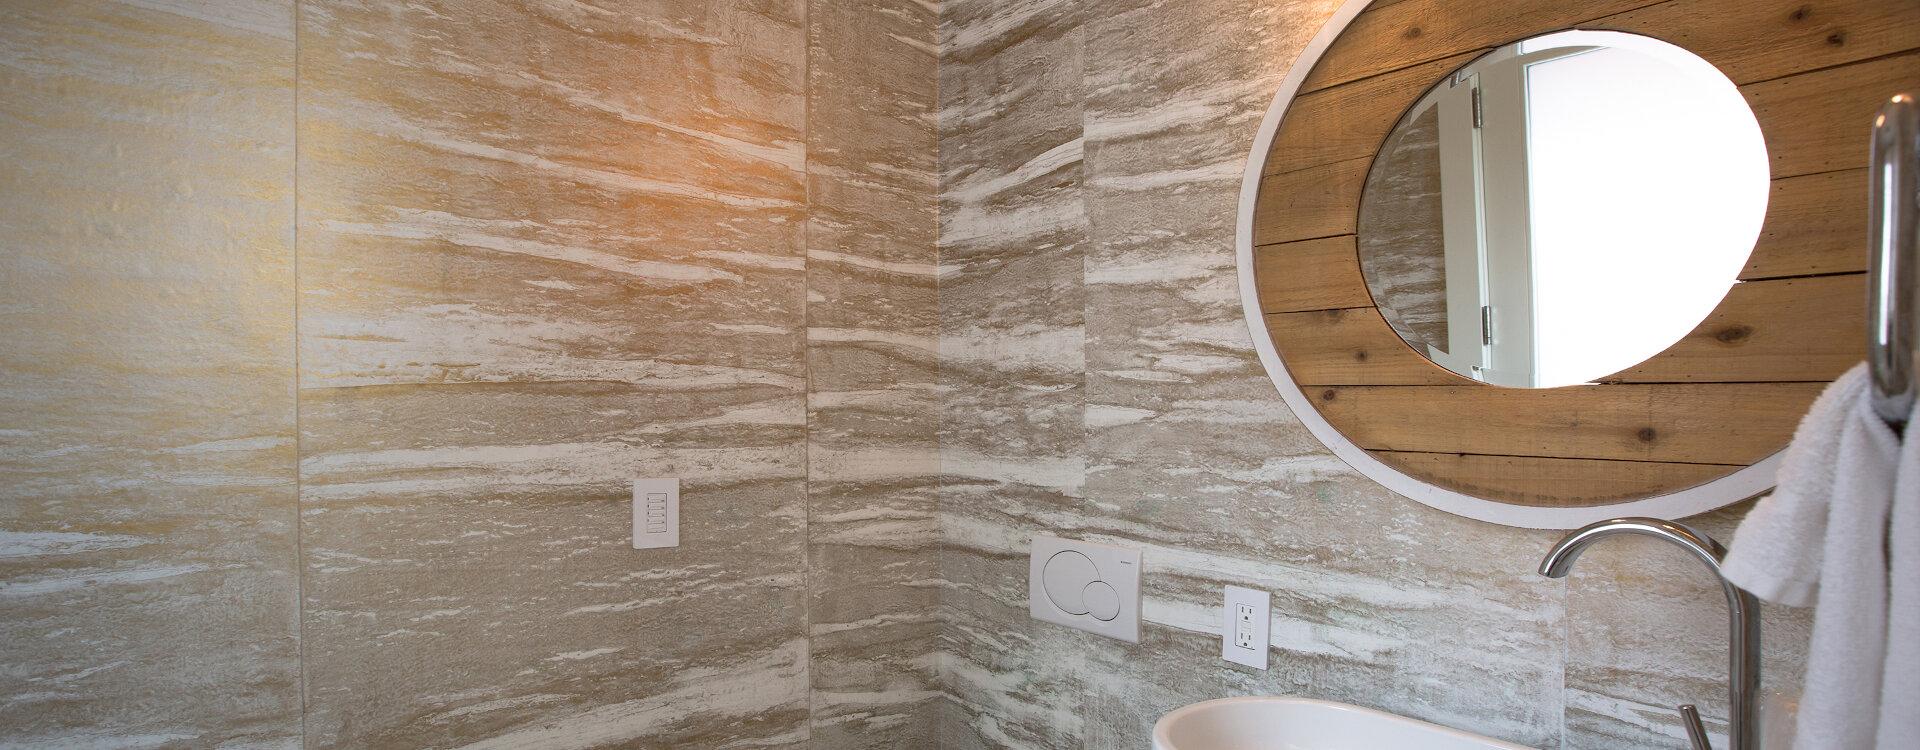 13-Telluride-Meribel-Penthouse-Powder-Room-web